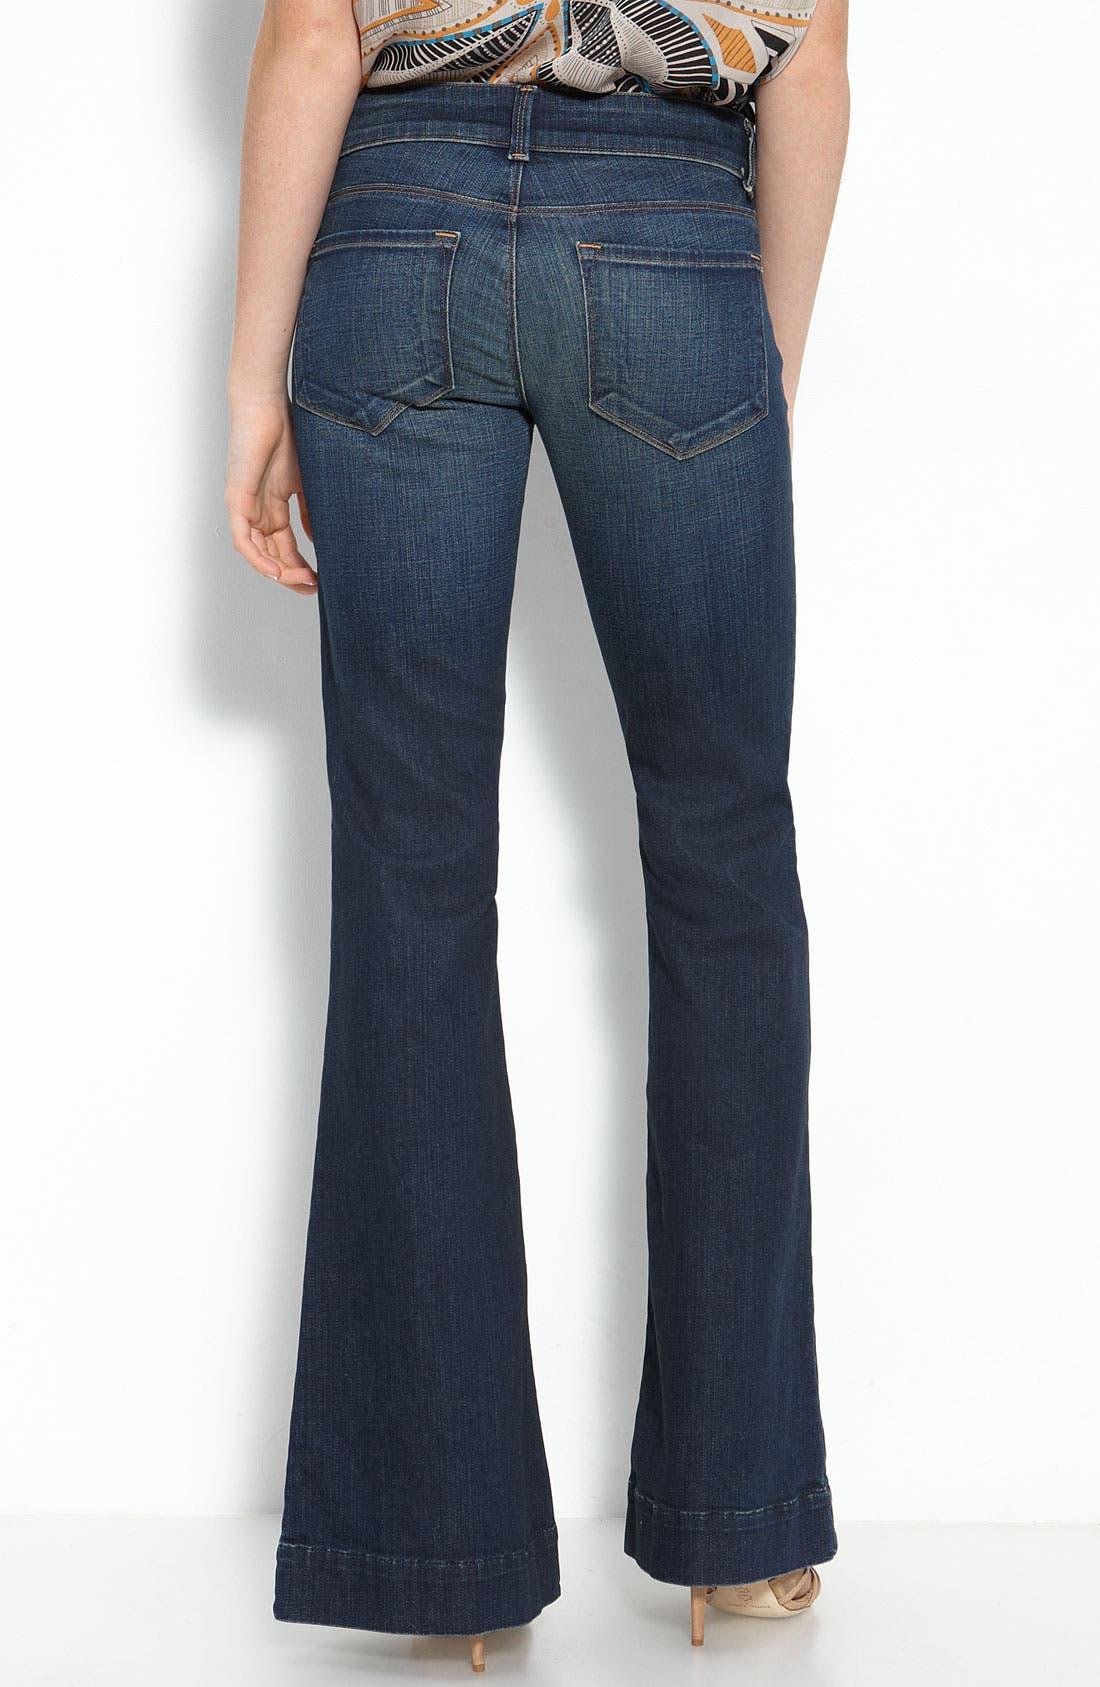 Alternate Image 1 Selected - J Brand 'Lovestory' Low Rise Bell Bottom Stretch Jeans (Dark Vintage Wash)